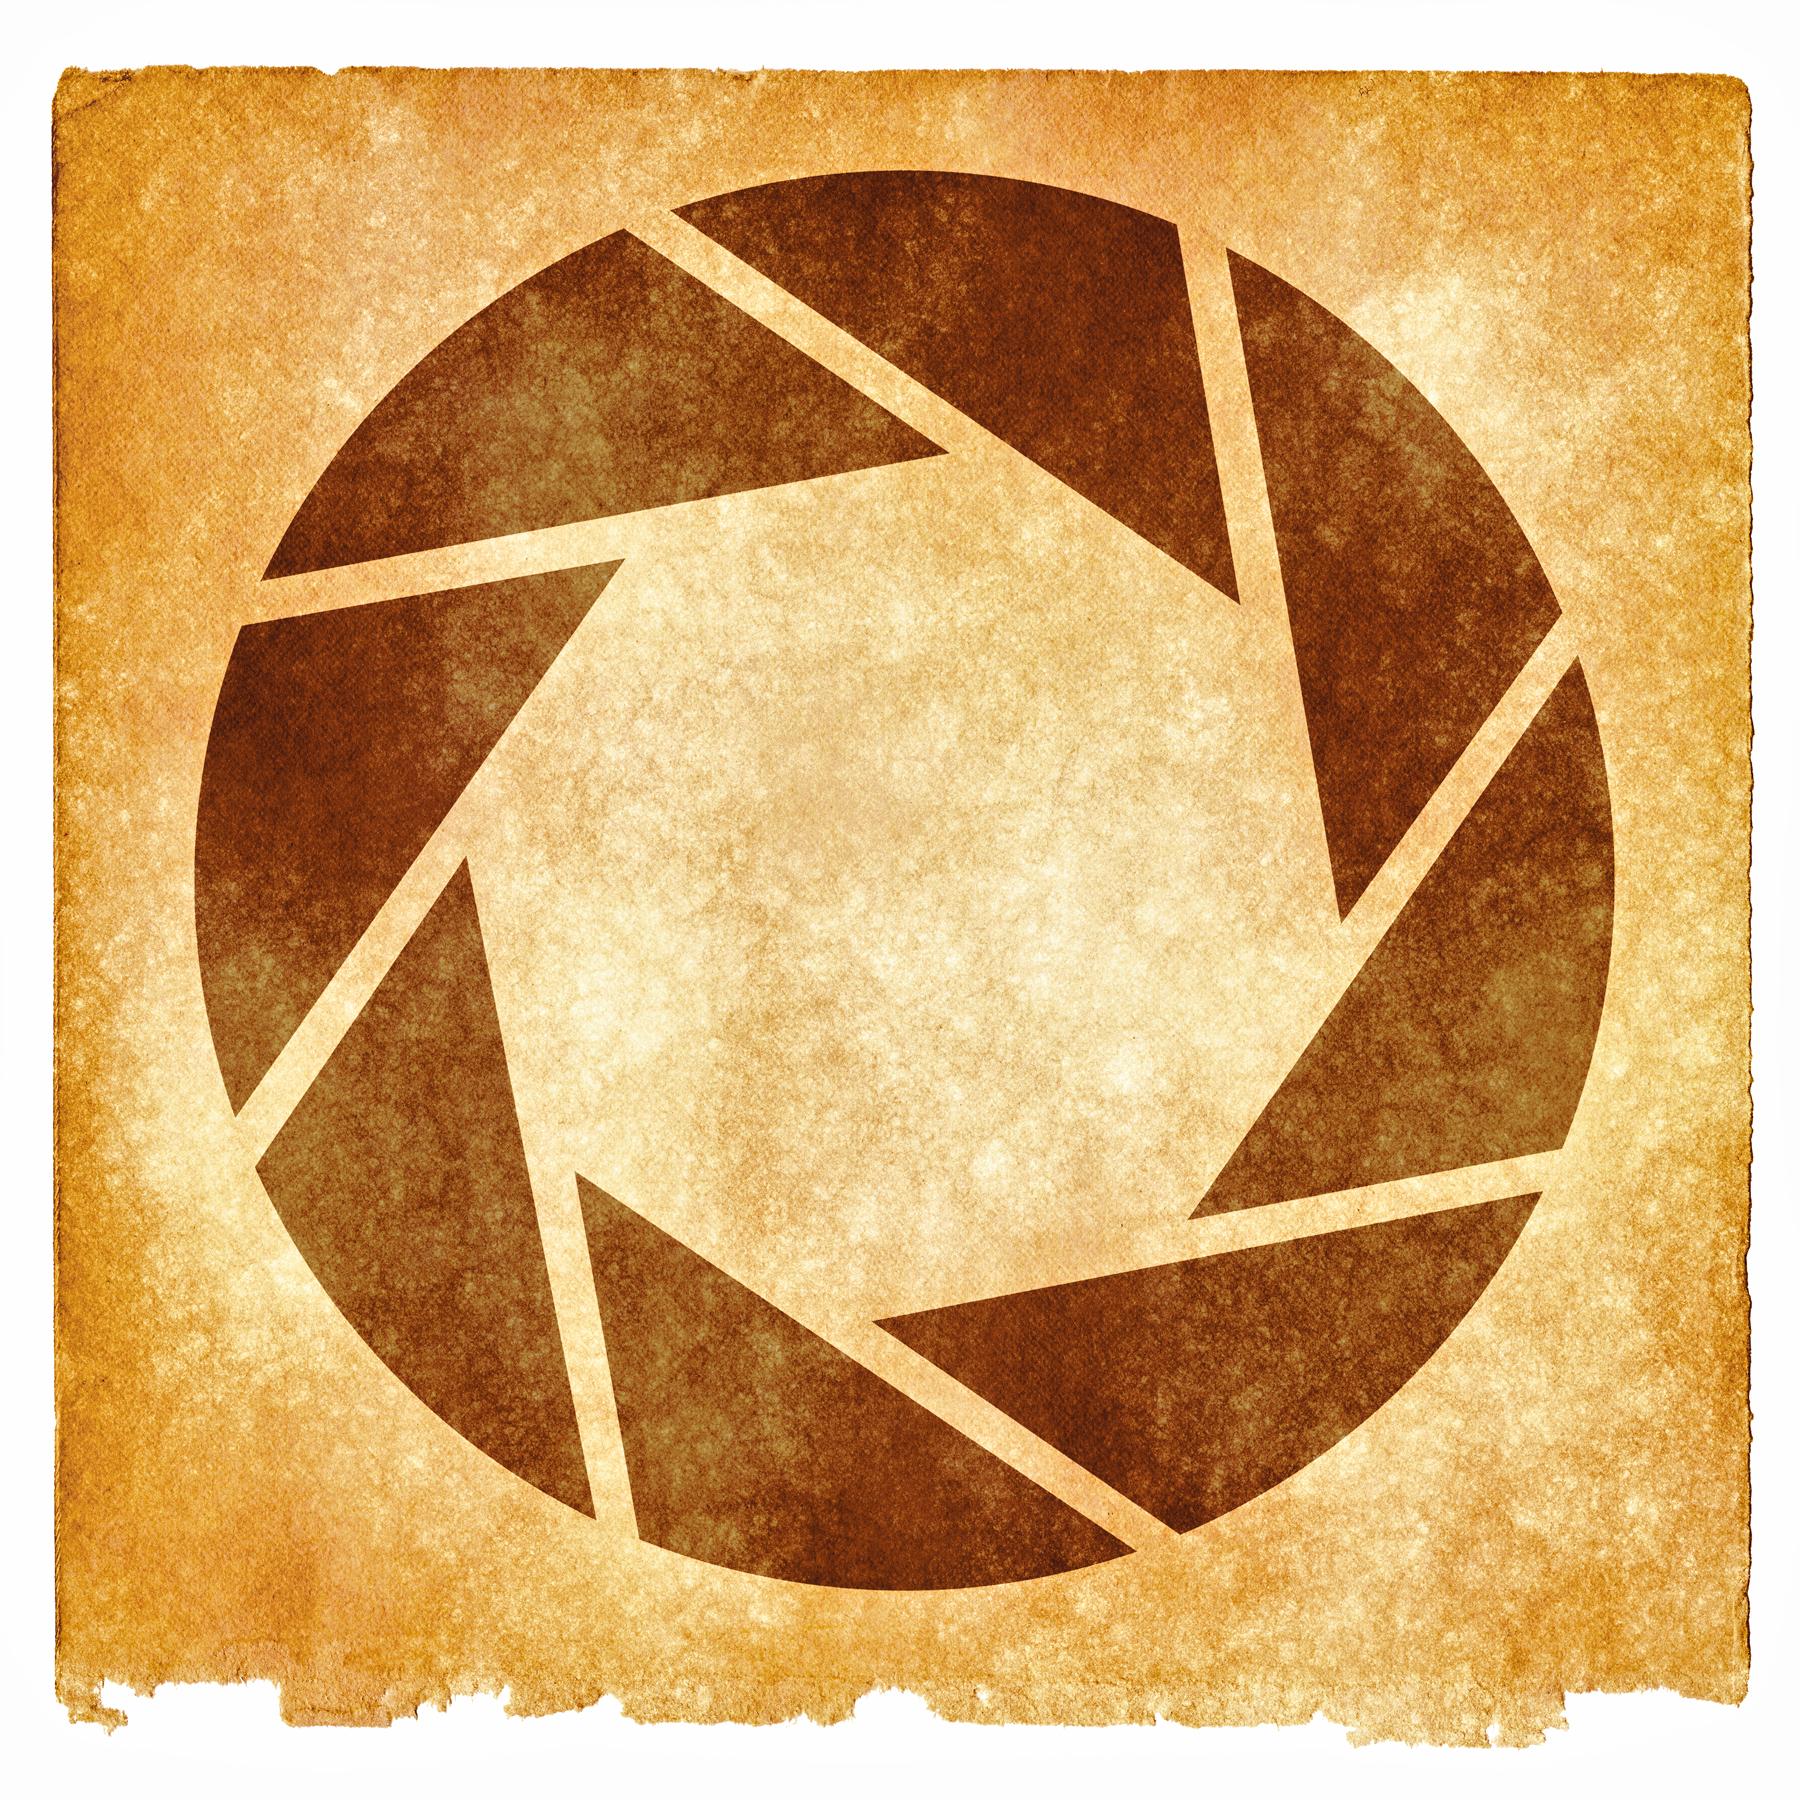 Lens aperture grunge symbol - sepia photo